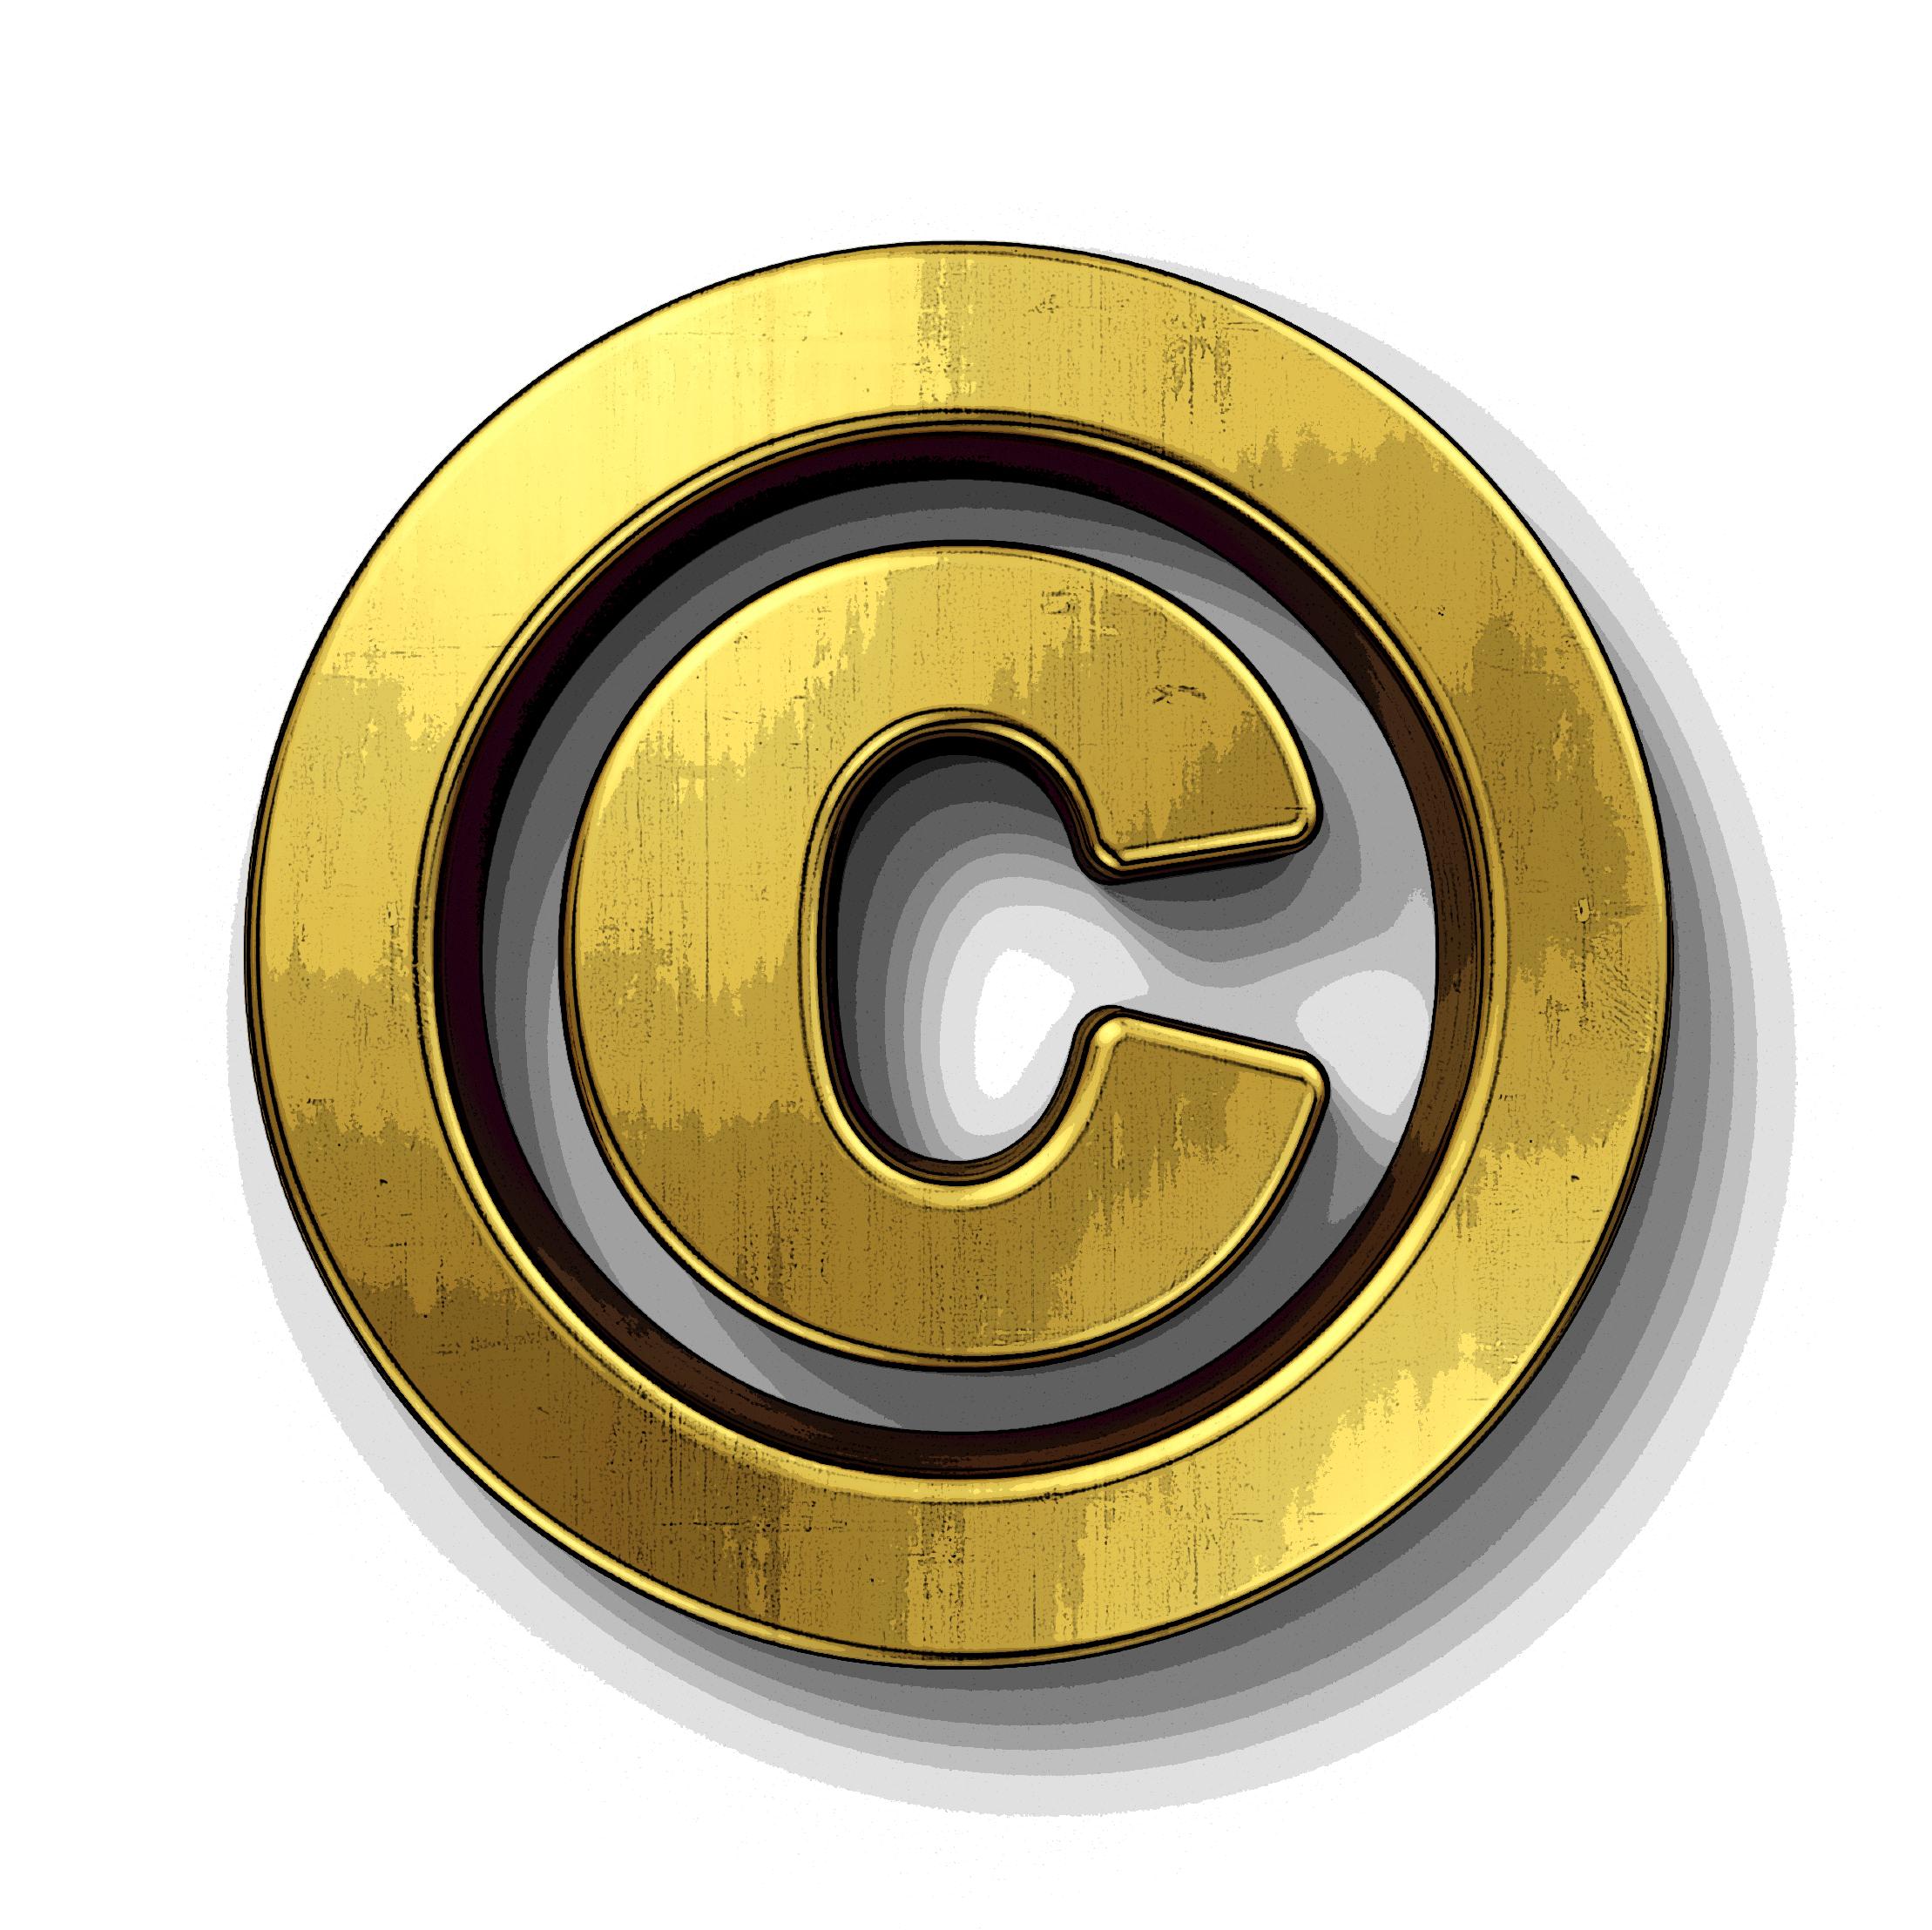 copyright basics crafts law